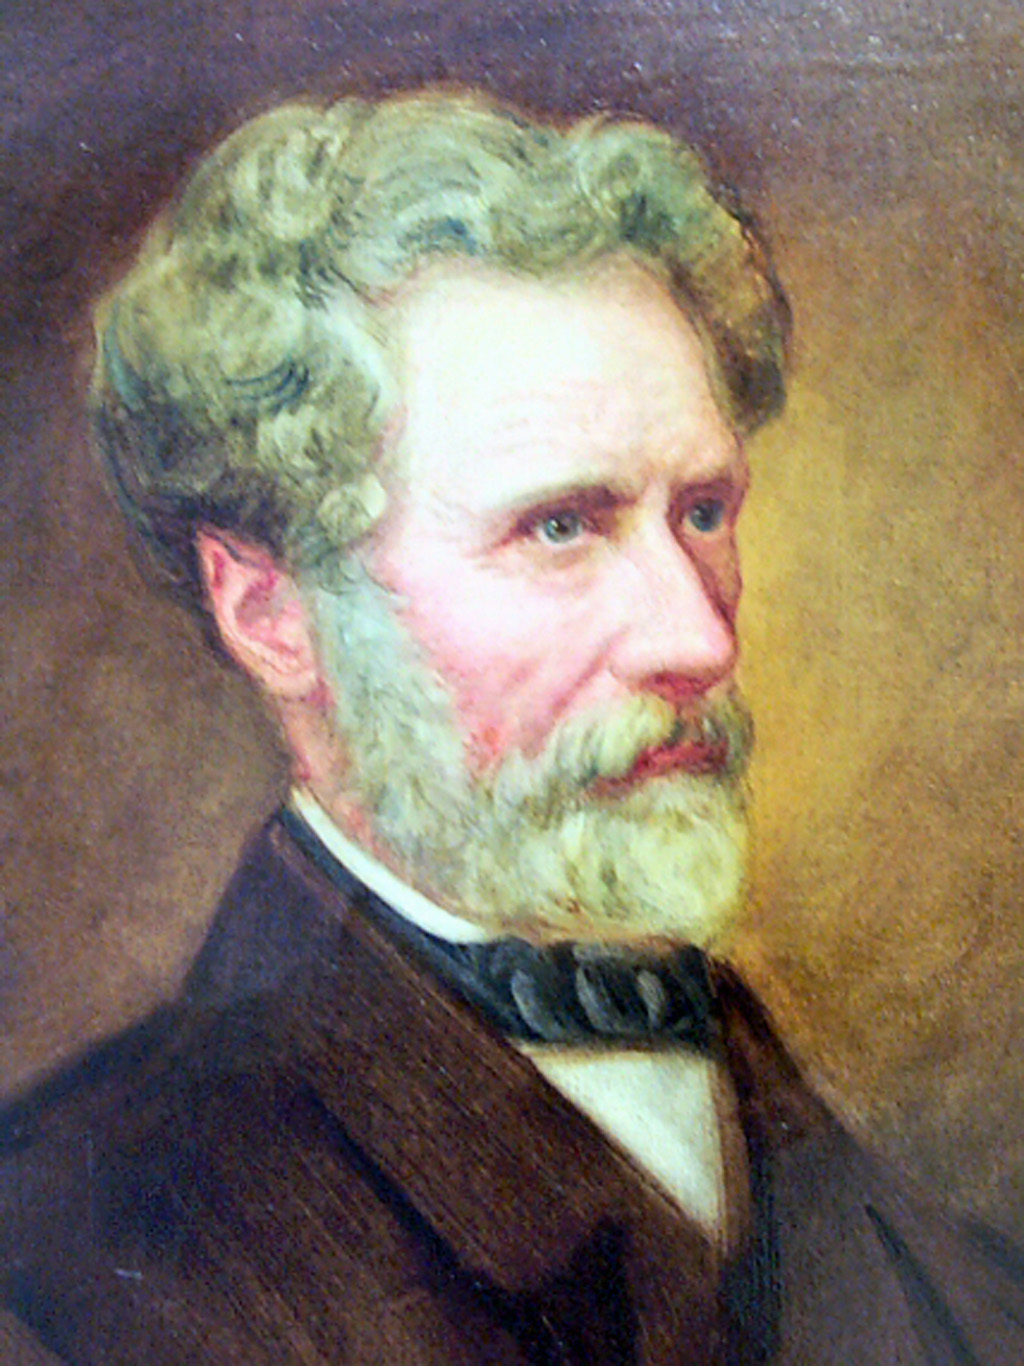 Carl Jacob Sundevall (1801 - 1875)